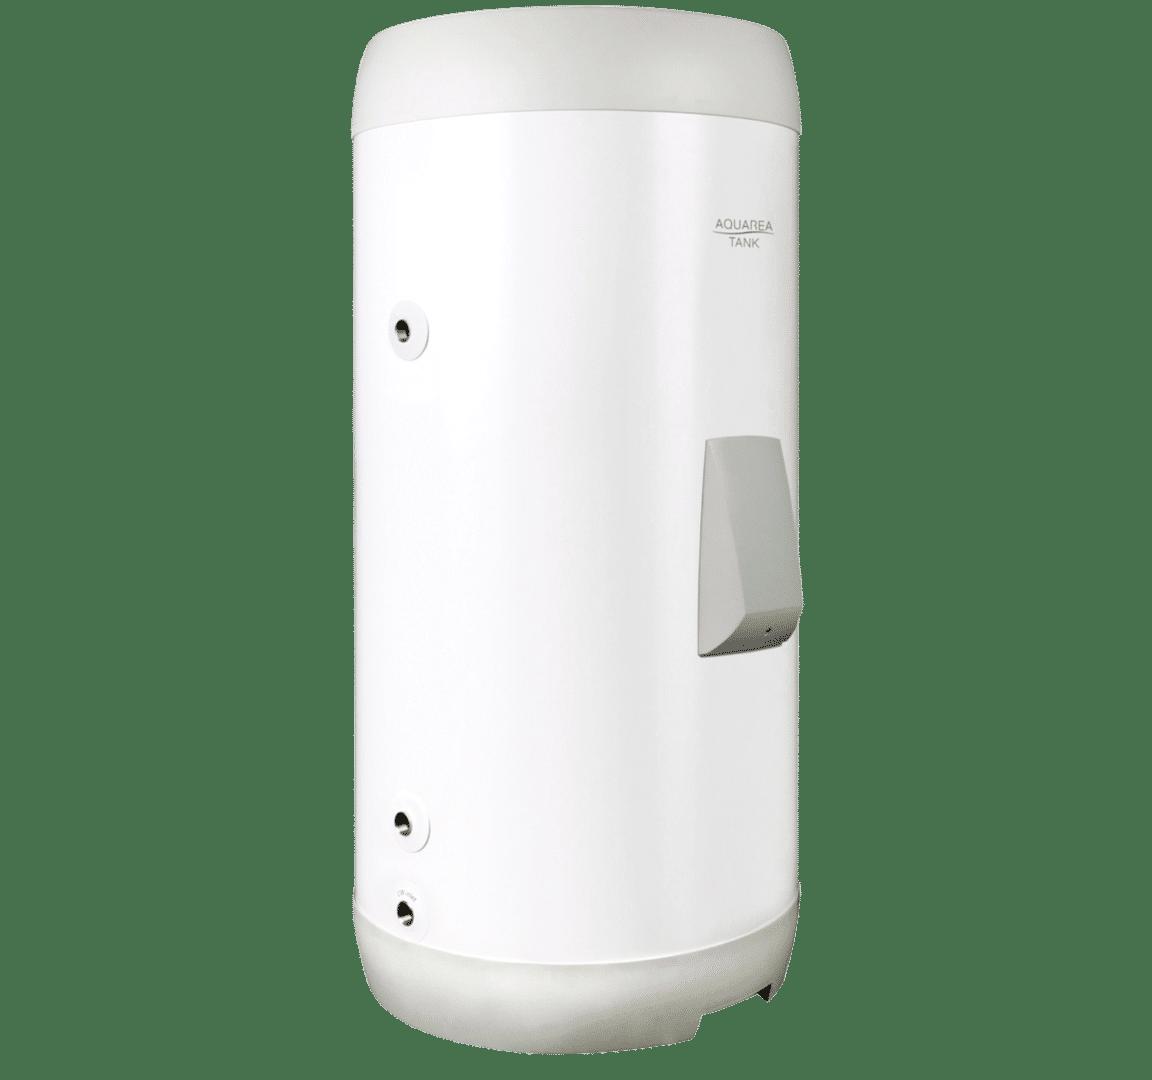 Afbeelding van Panasonic rvs boilertank